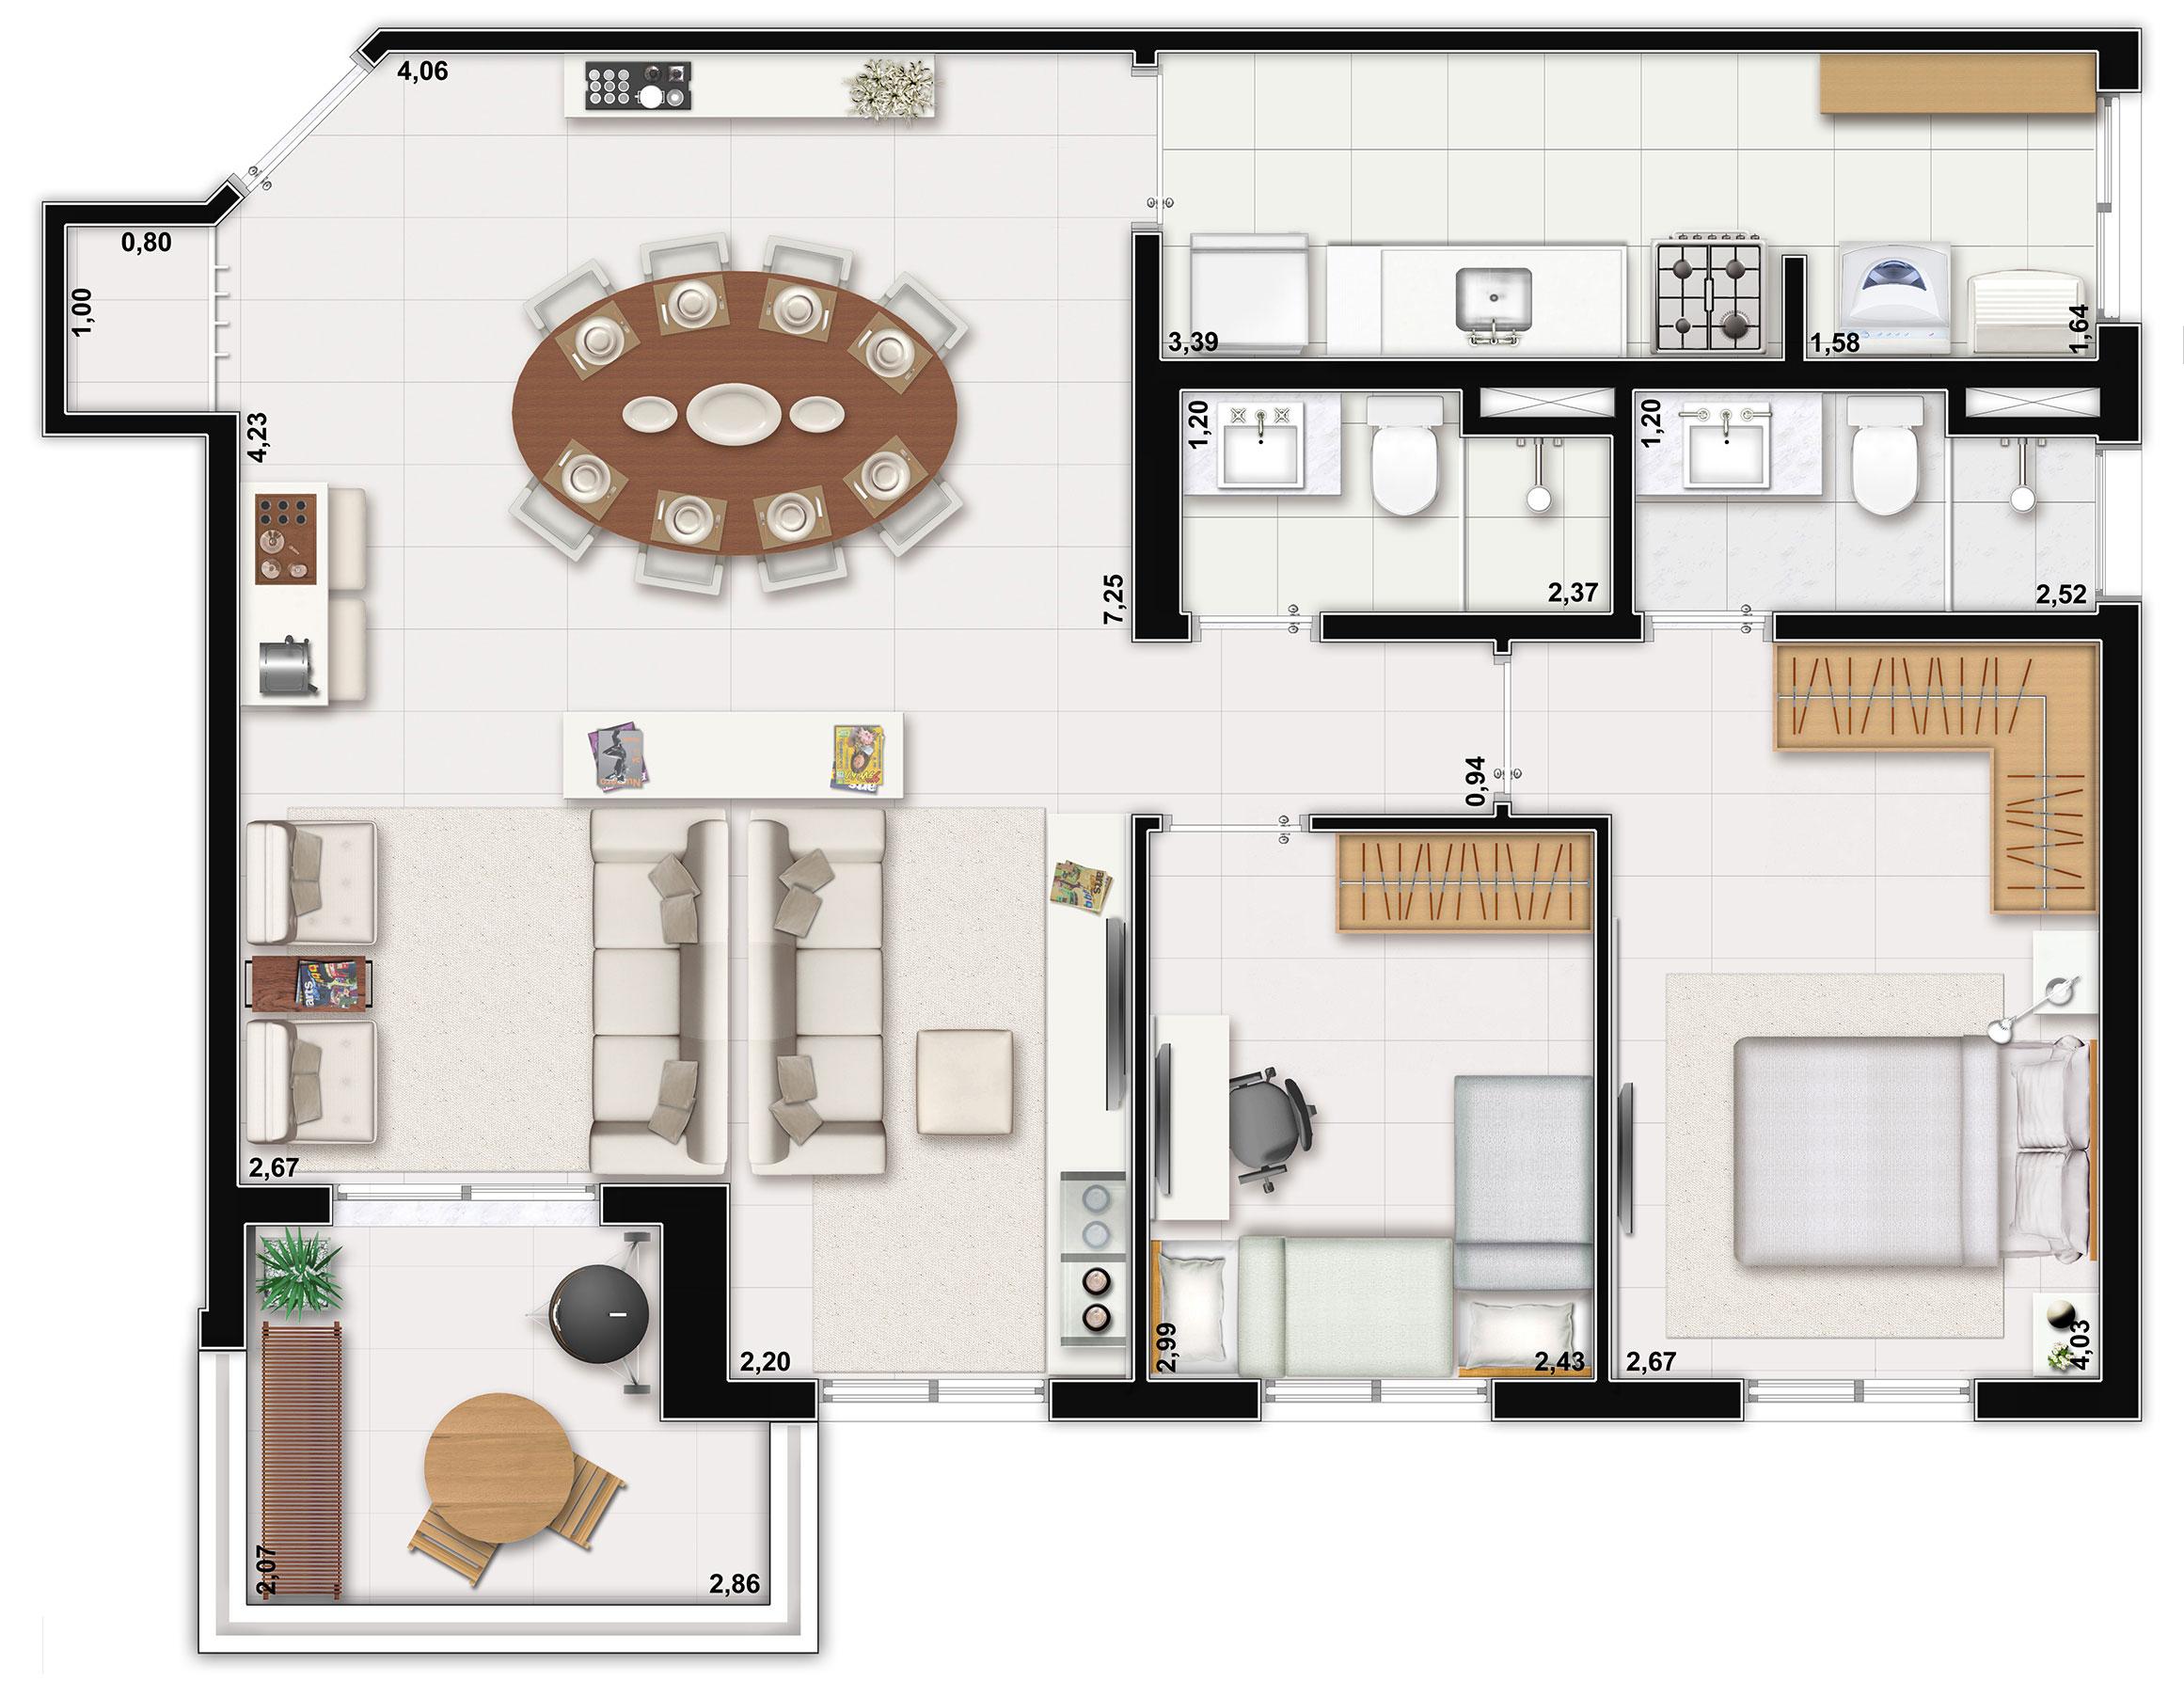 84m² - Living ampliado